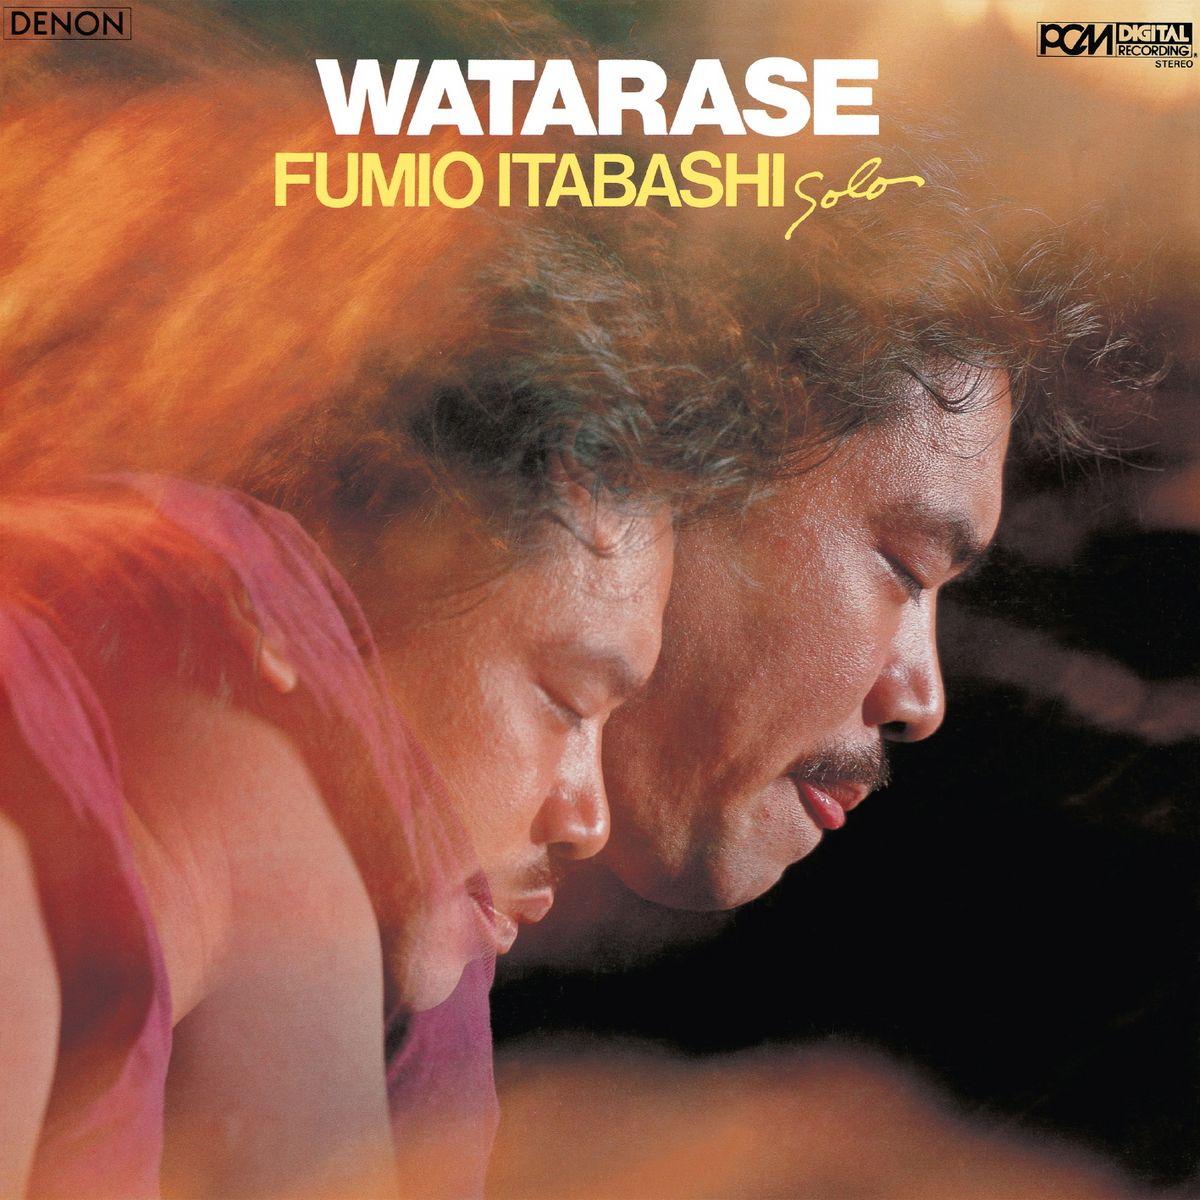 Mule Musiq издаст классический альбом японского джазмена Фумио Итабаши